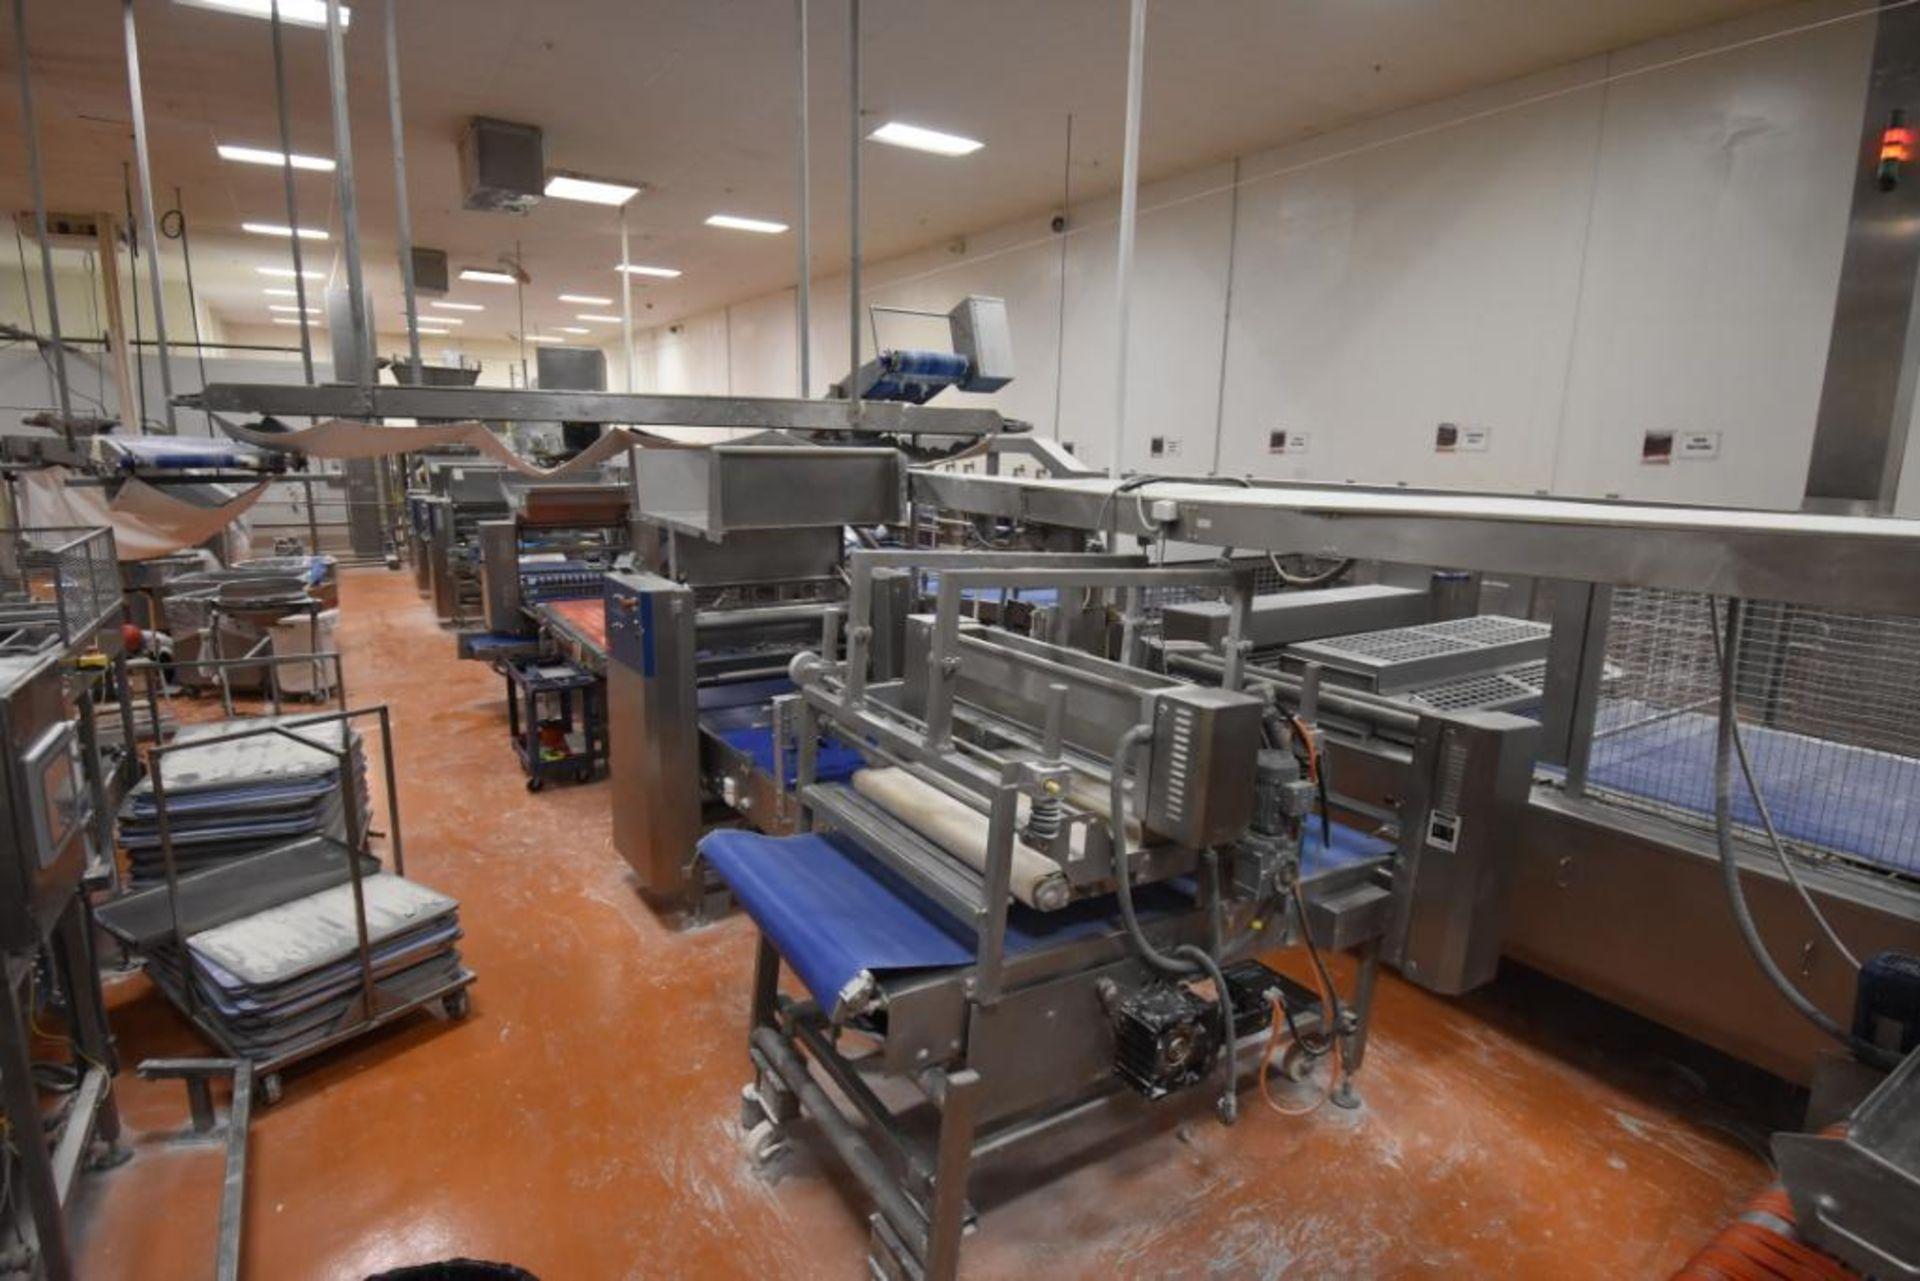 2007 Fritsch Laminator 3000 dough line - Image 237 of 280